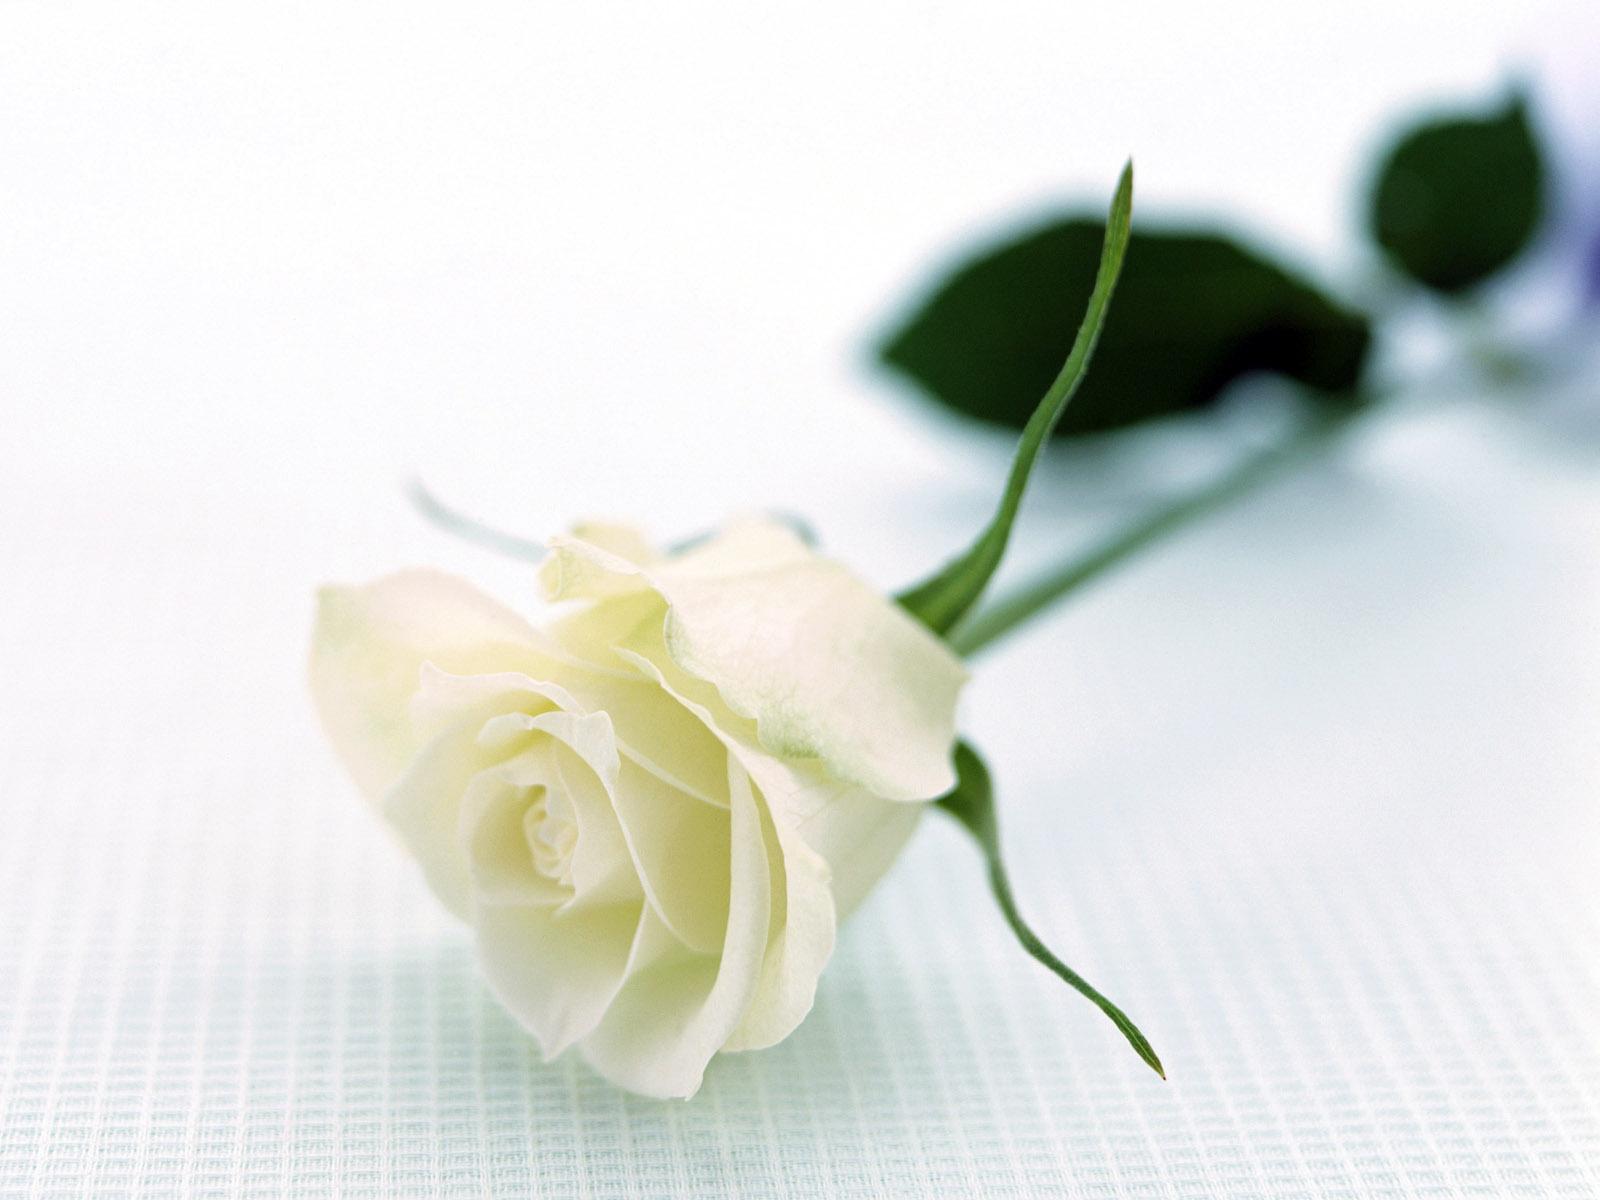 http://4.bp.blogspot.com/_9TZAdMU5yWQ/TR3URohGKTI/AAAAAAAAA2I/yOJpbPHDrJw/s1600/white-rose-wallpapers_5642_1600x1200.jpg